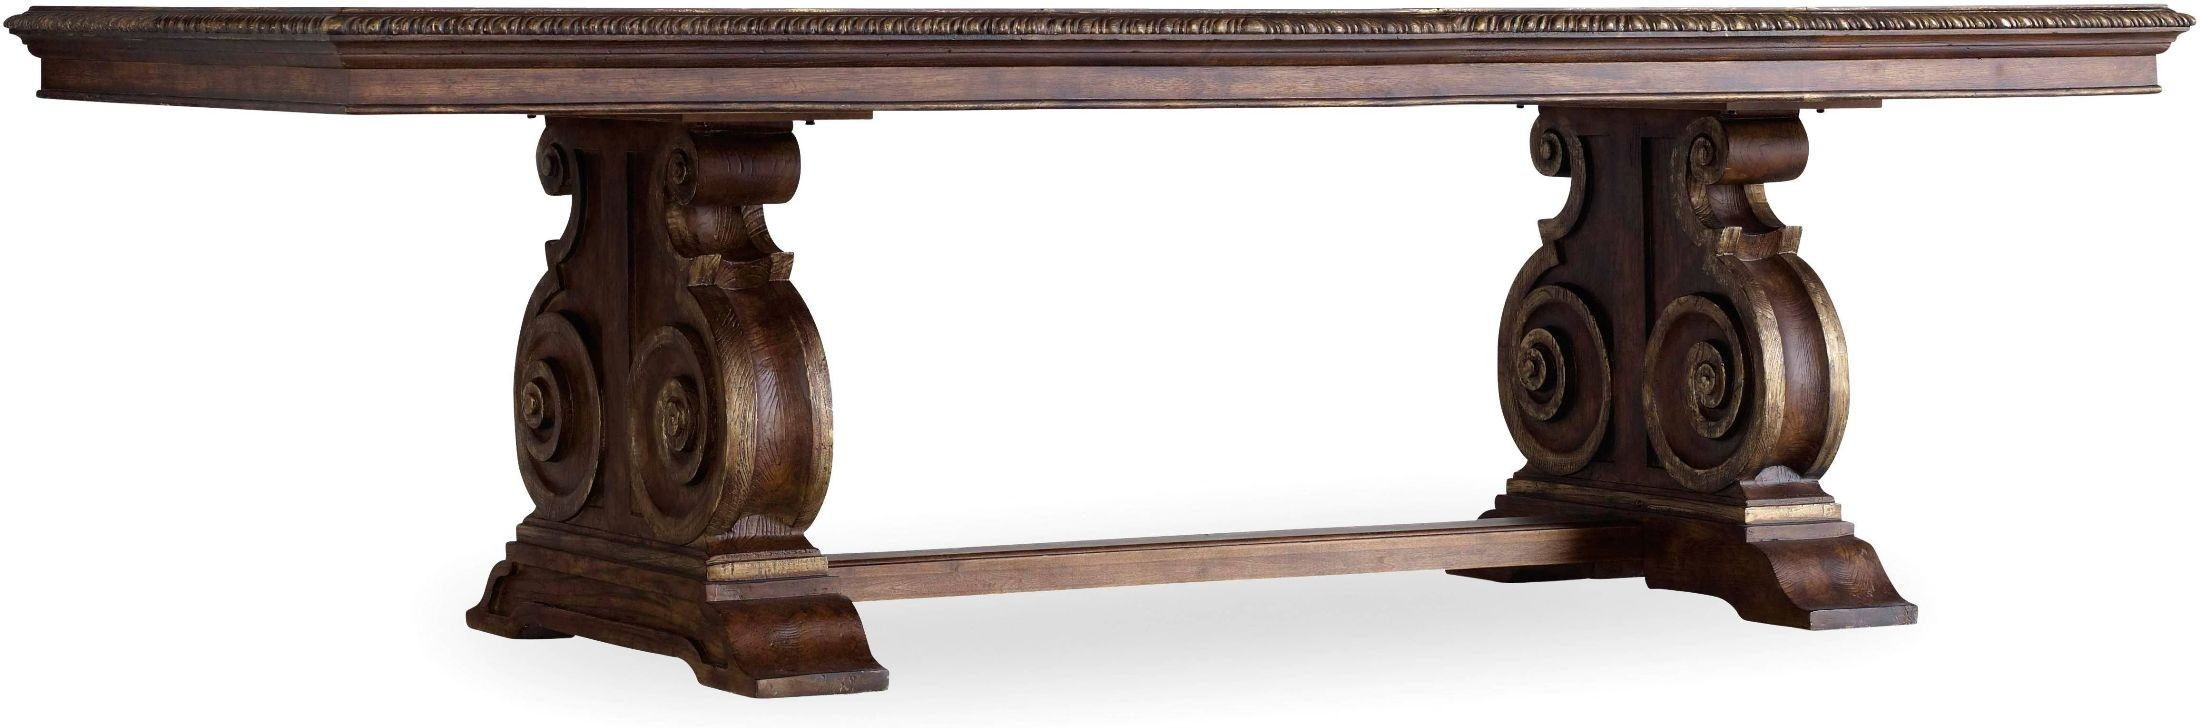 adagio dark wood rectangular dining table 5091 75207 hooker